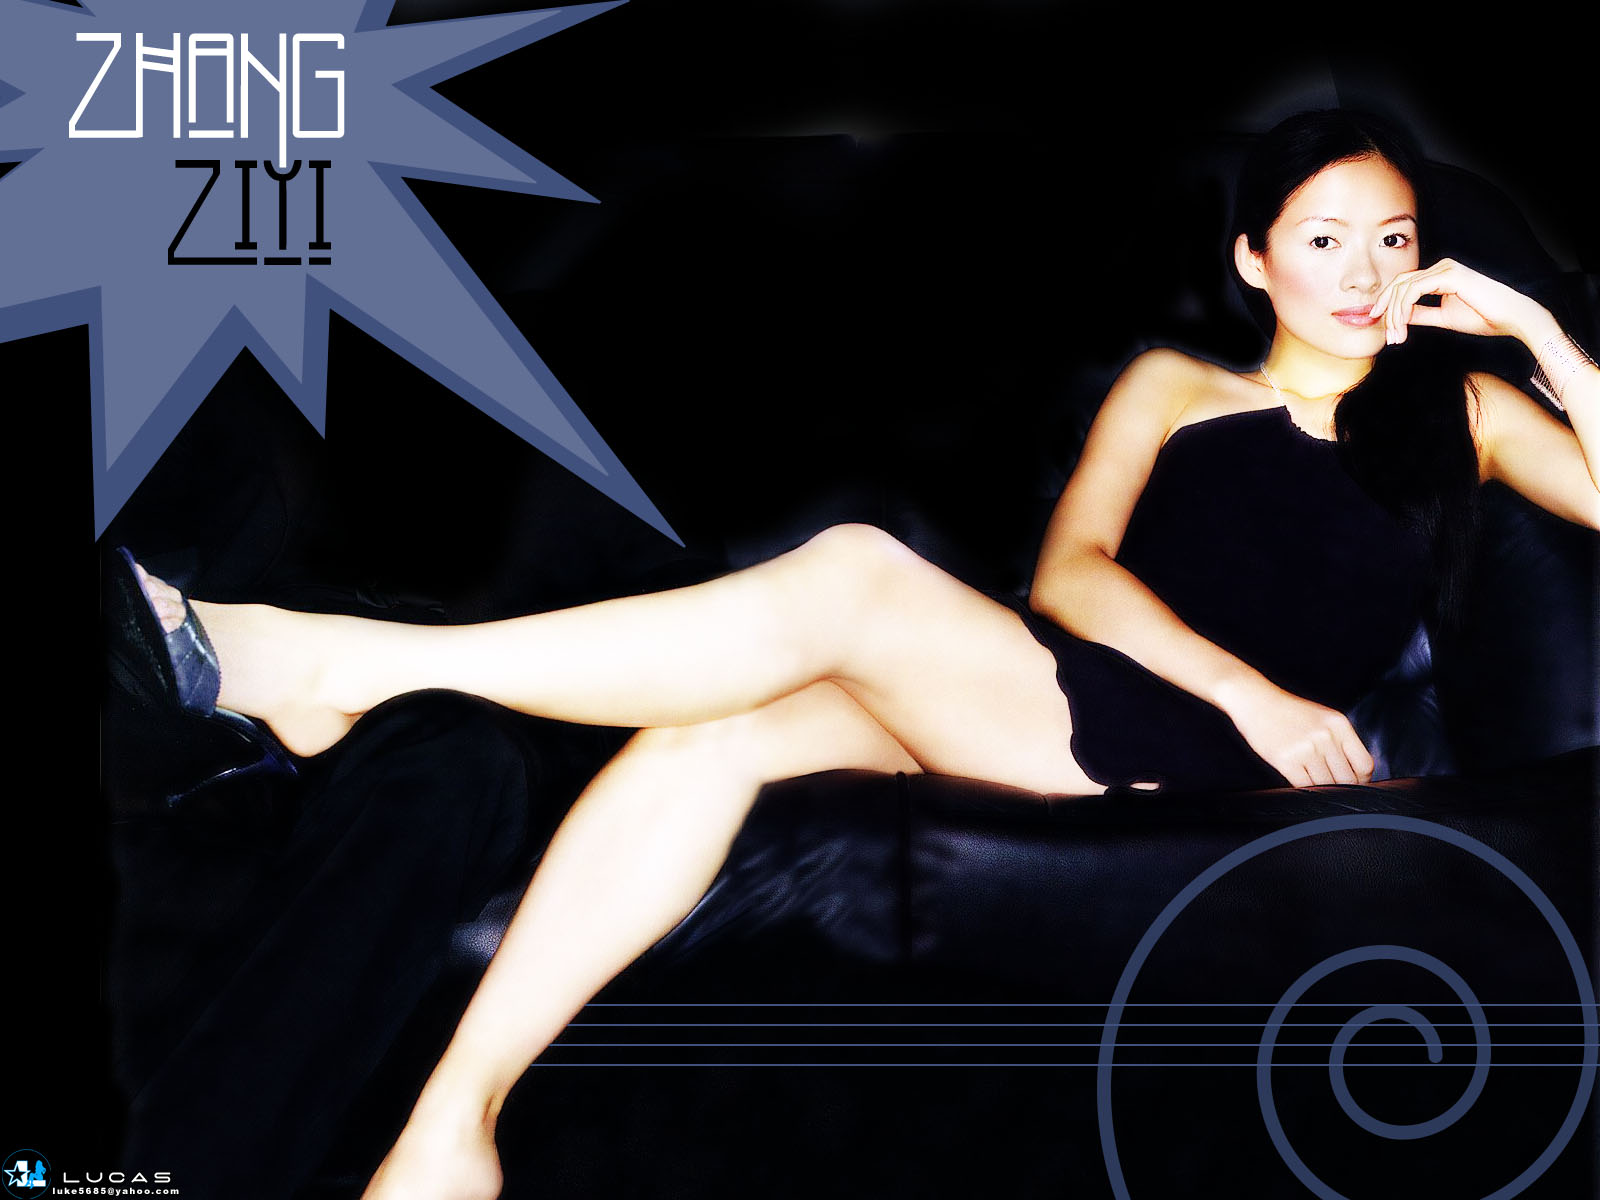 Zhang ziyi 8